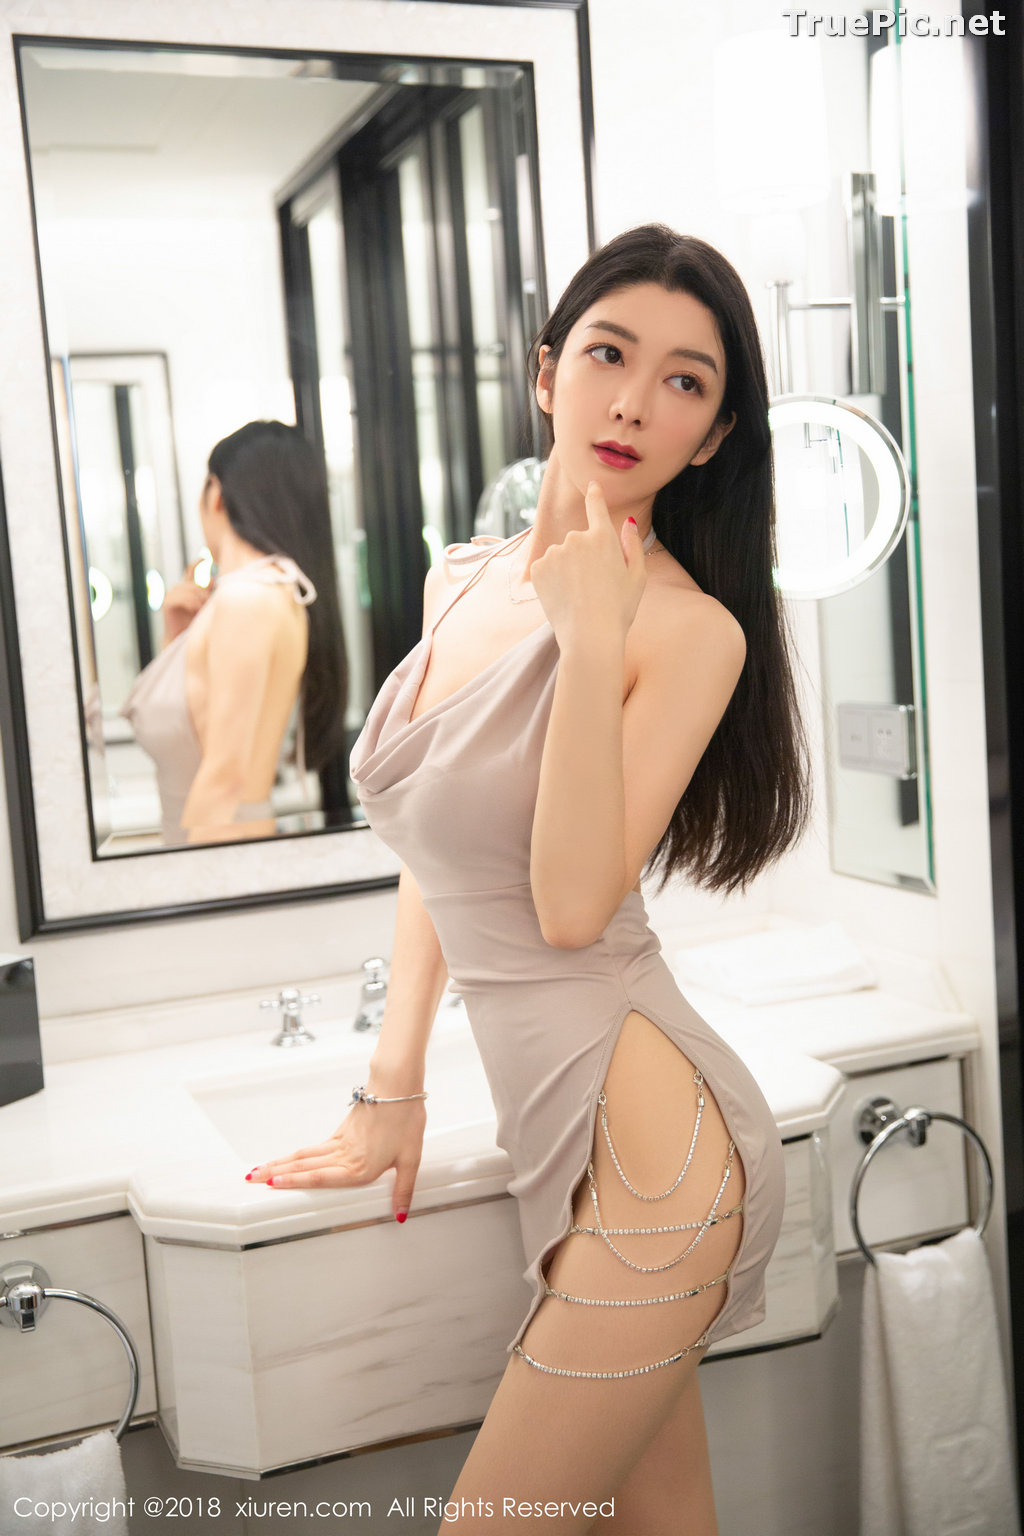 Image XIUREN No.1141 - Chinese Model - Xiao Reba (Angela小热巴) - Sexy Dress Tonight - TruePic.net - Picture-26